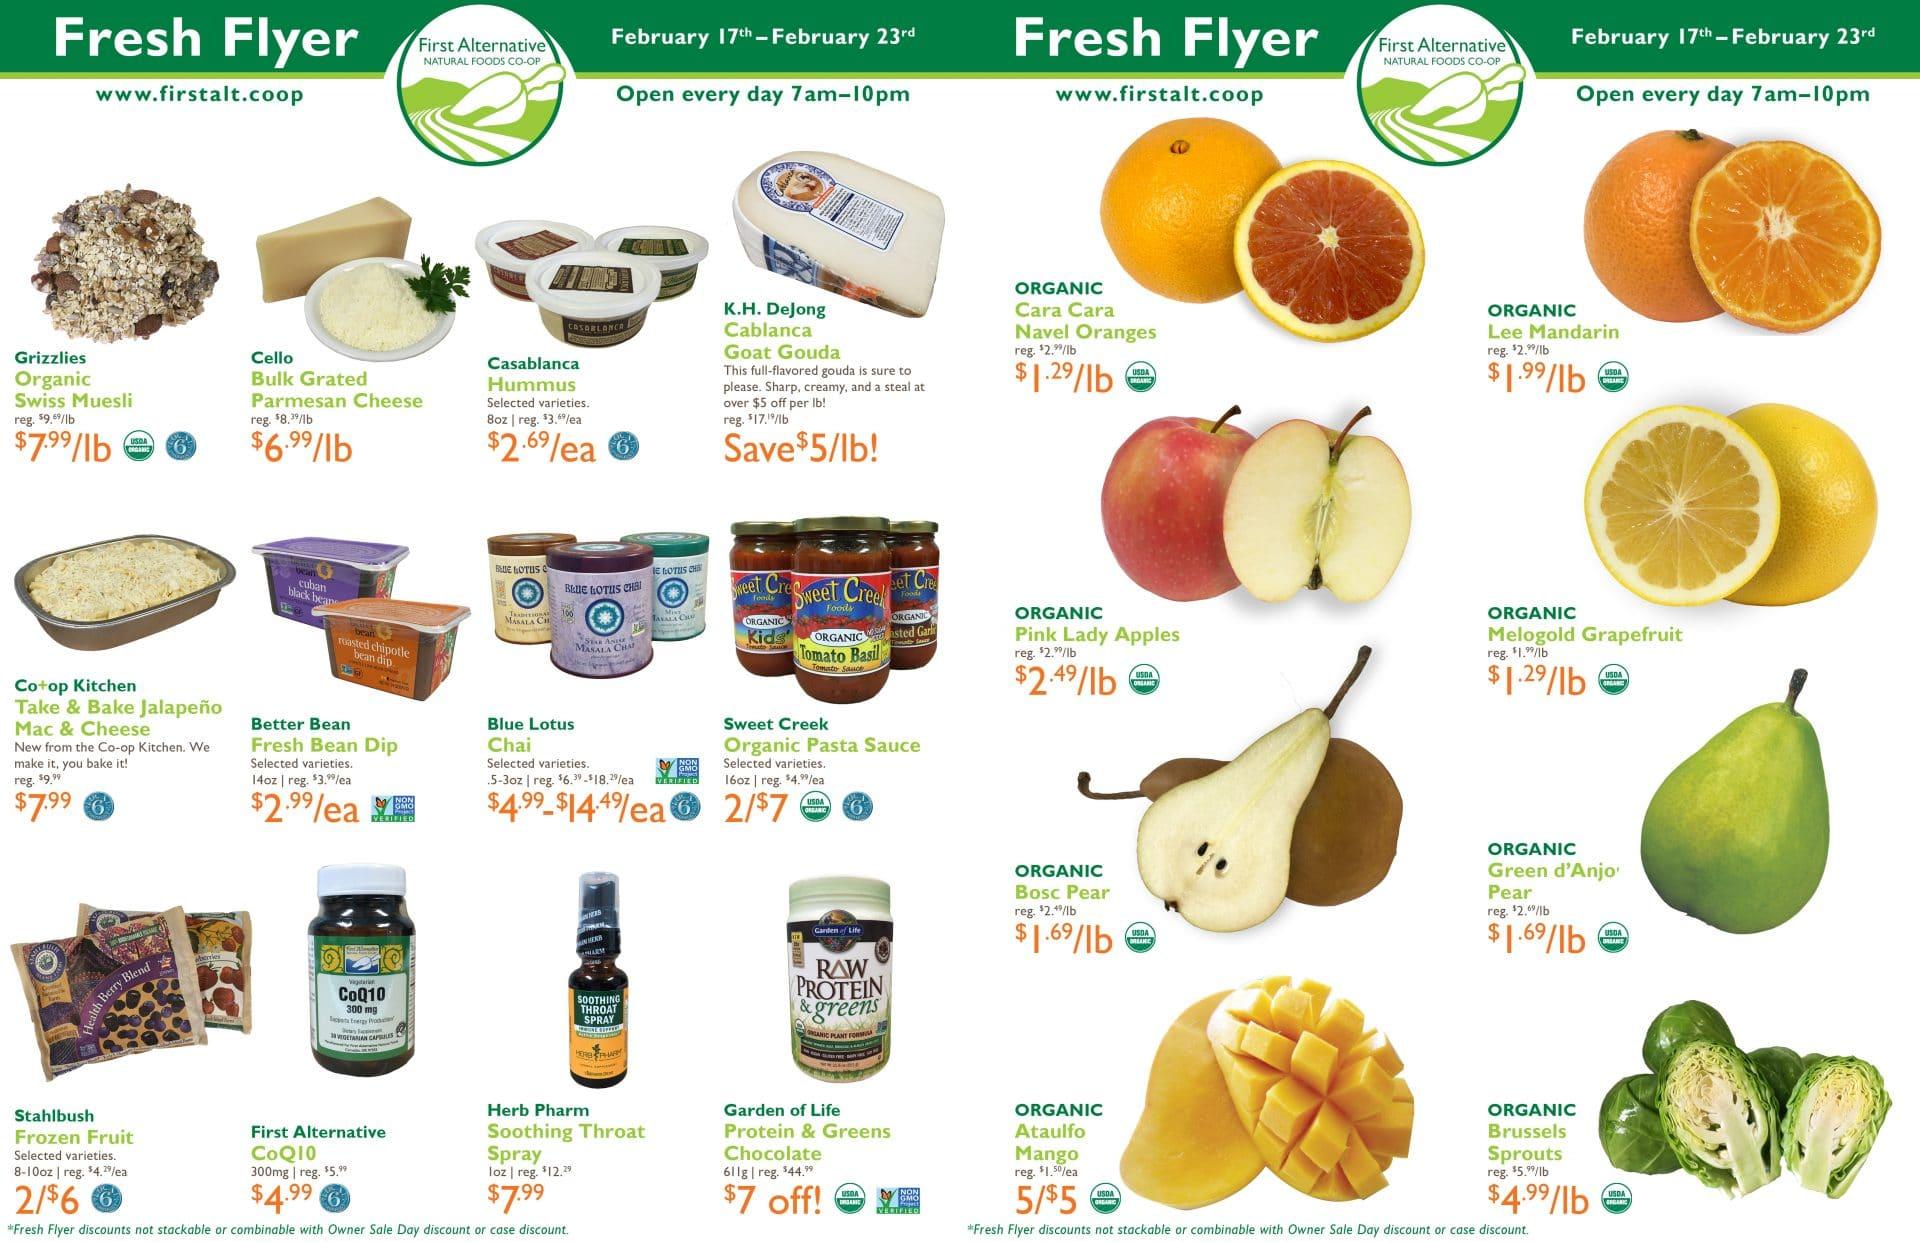 First Alternative Co-op Fresh Flyer February 17 - February 23